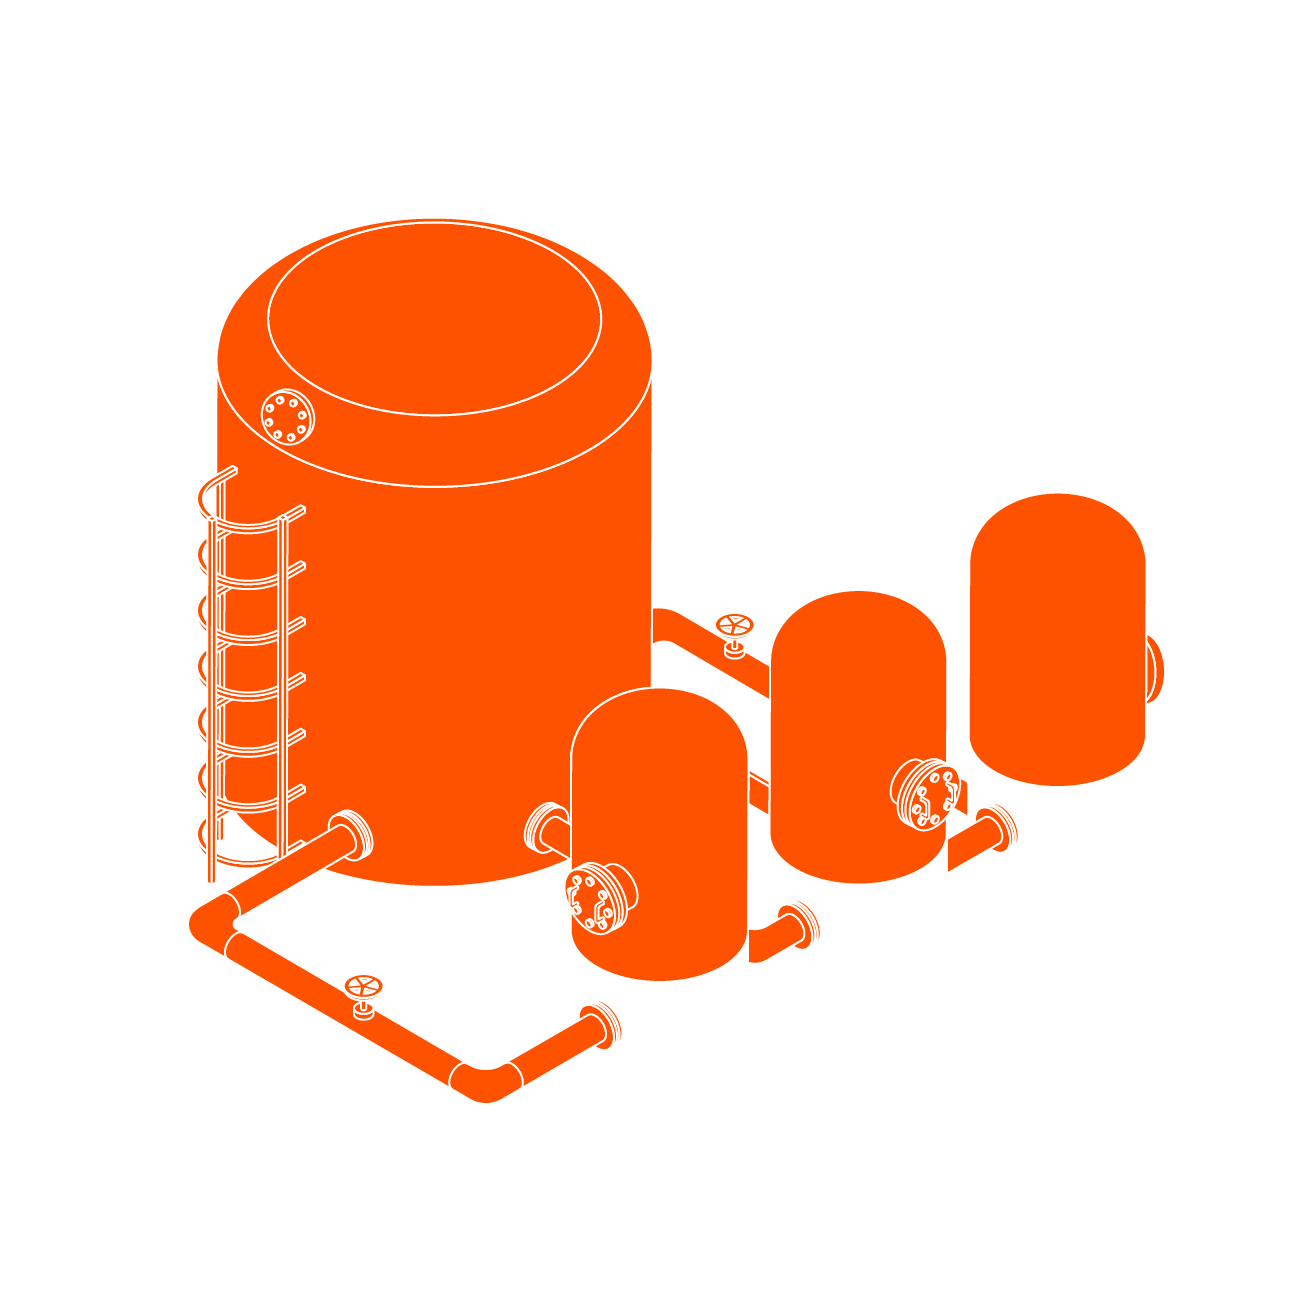 Infrastructure Design